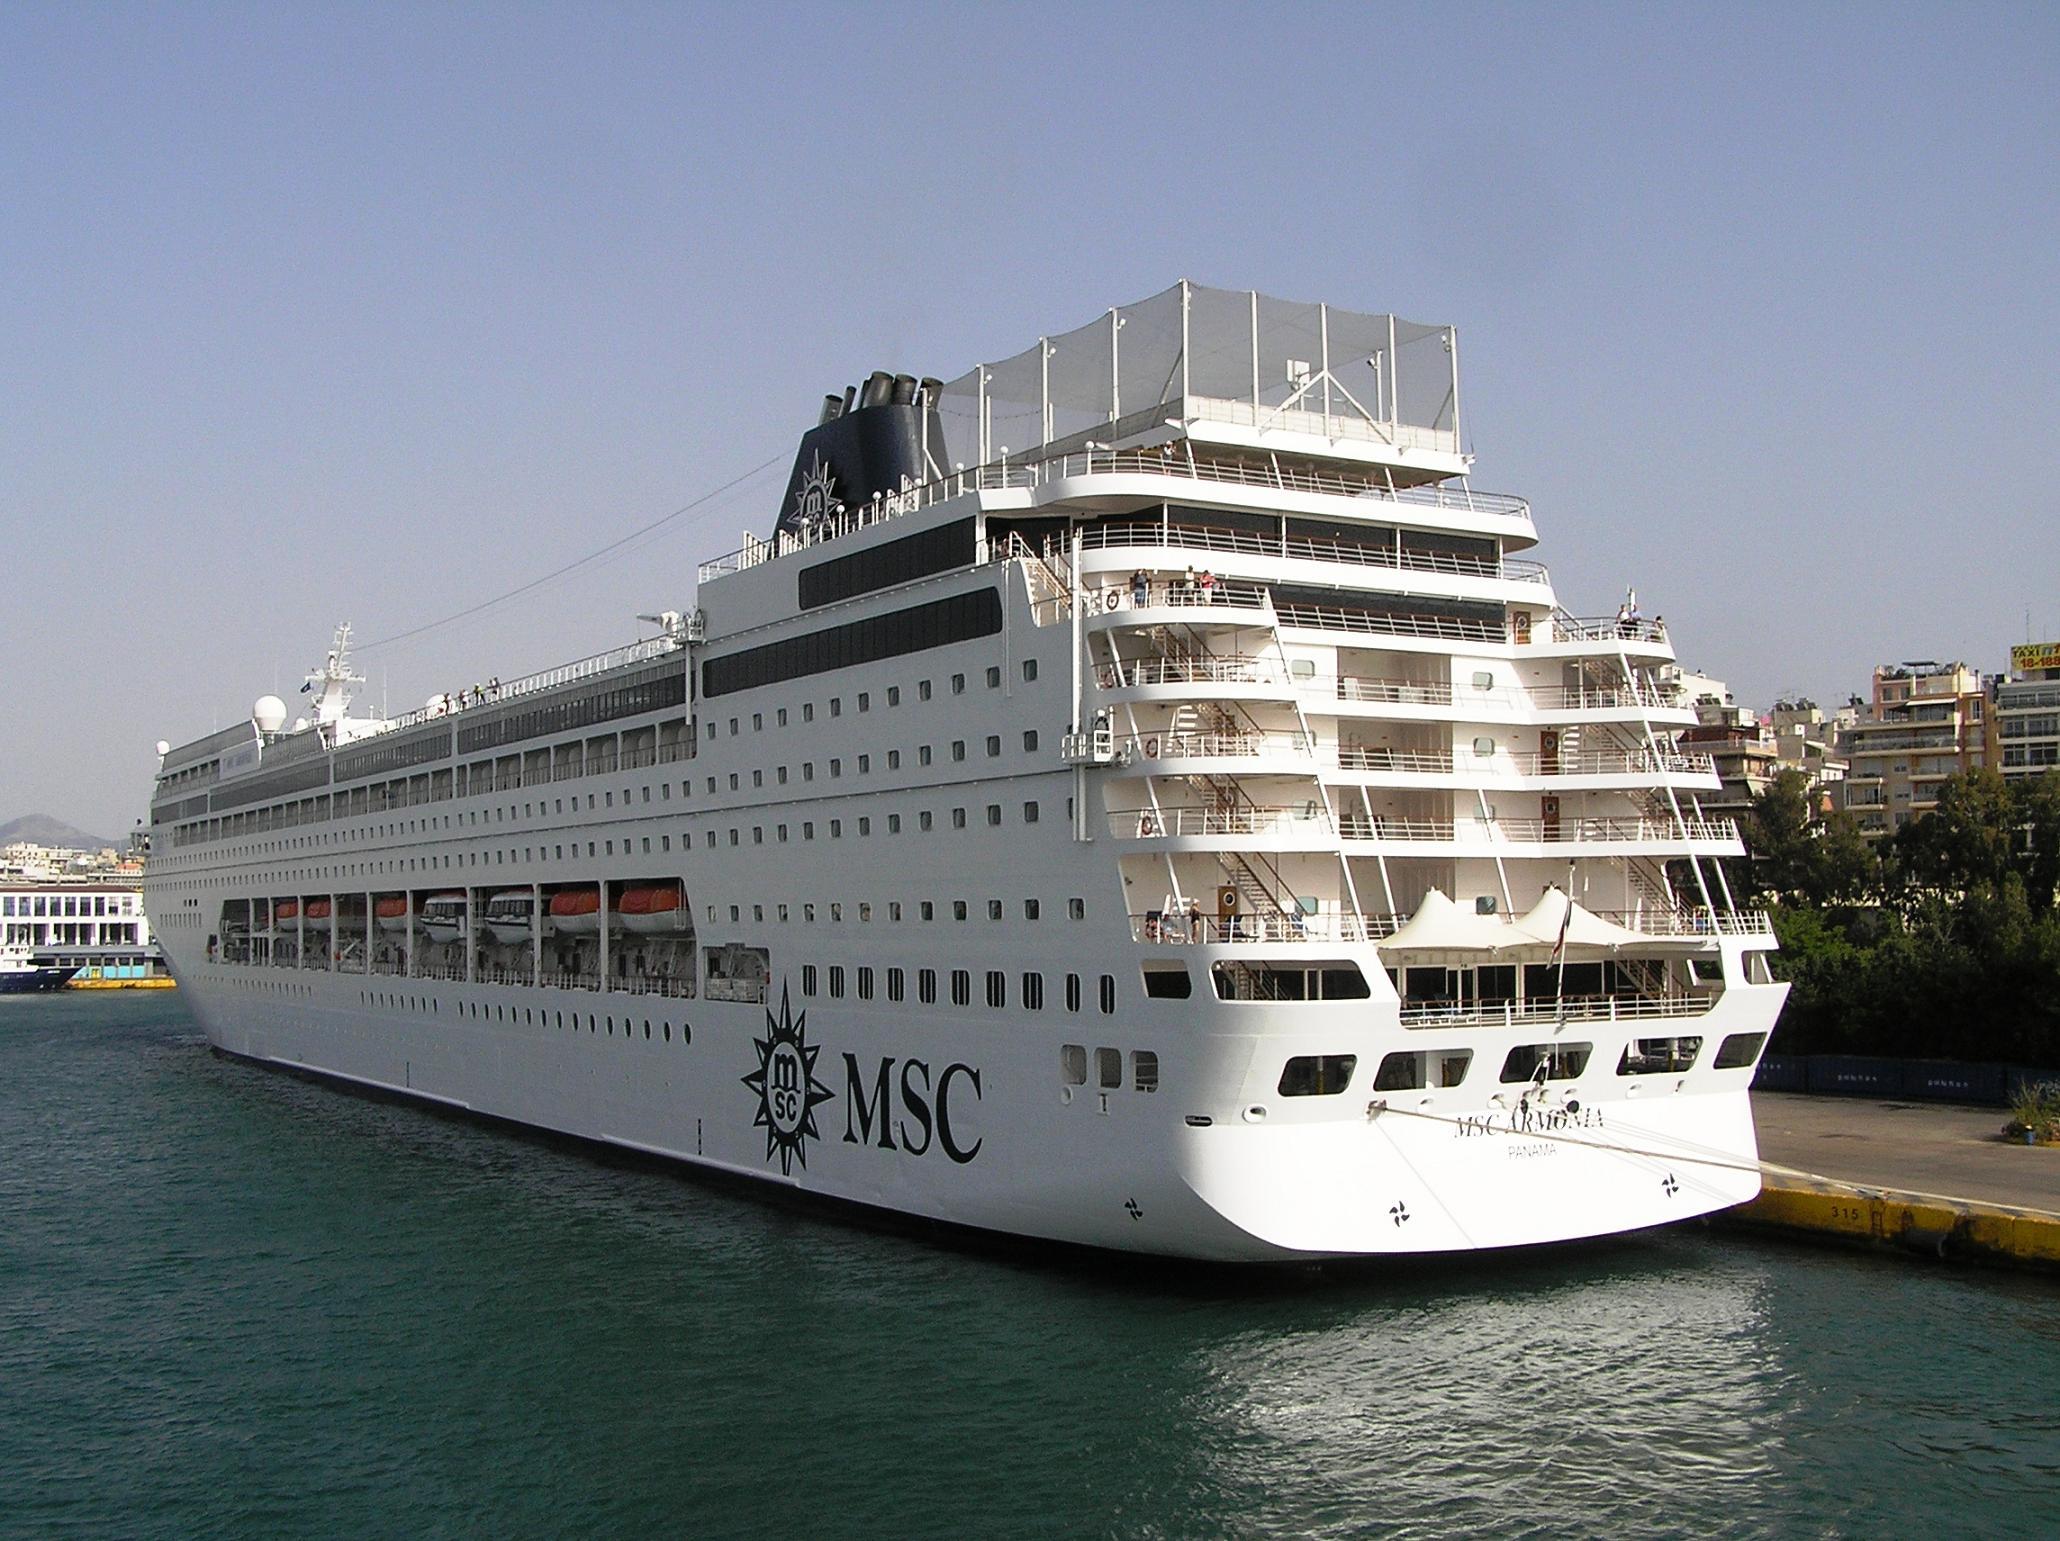 MSC Armonia MSC Armonia Shipfriends - Msc armonia